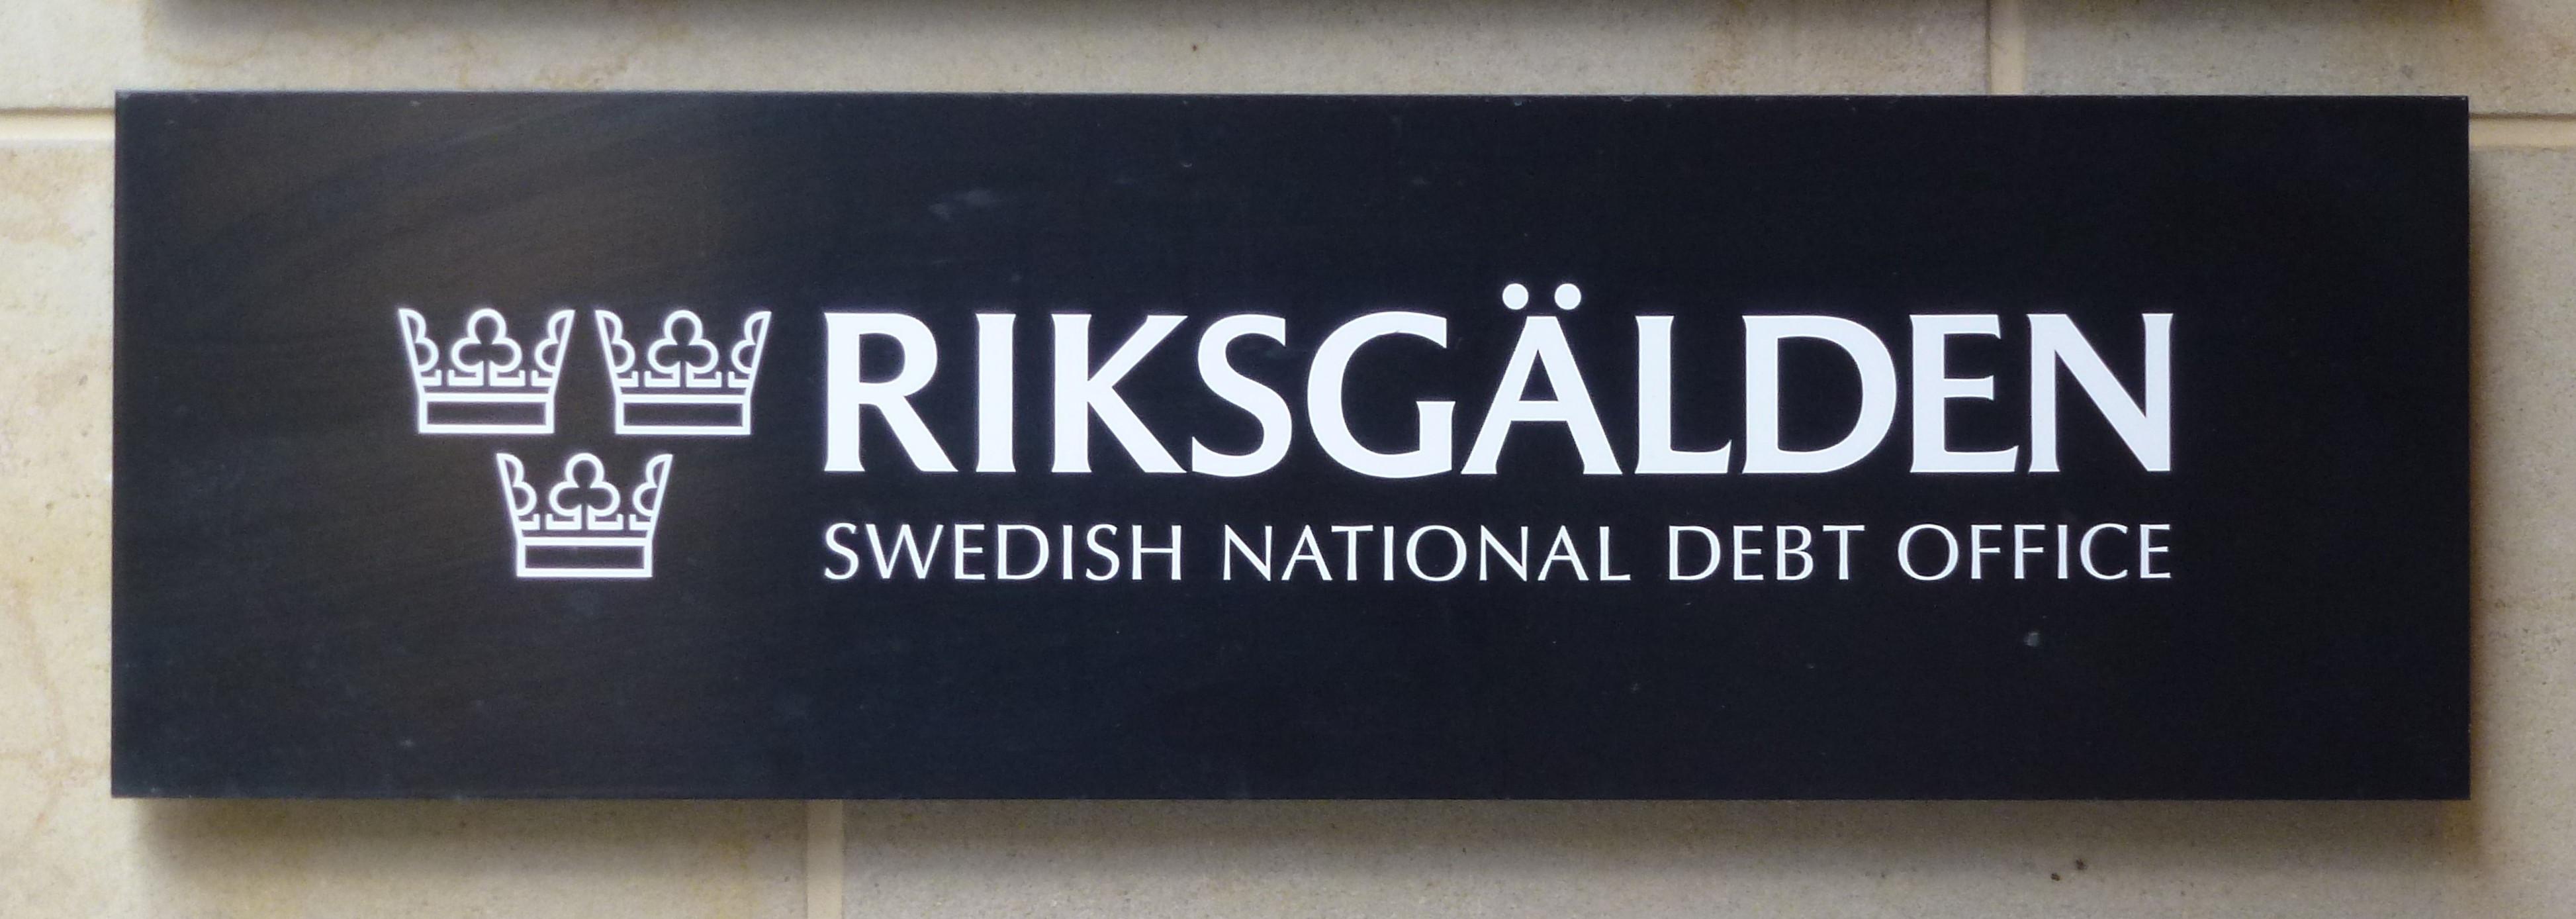 Fil Riksgälden skylt.jpg – Wikipedia ed198f0c79da8